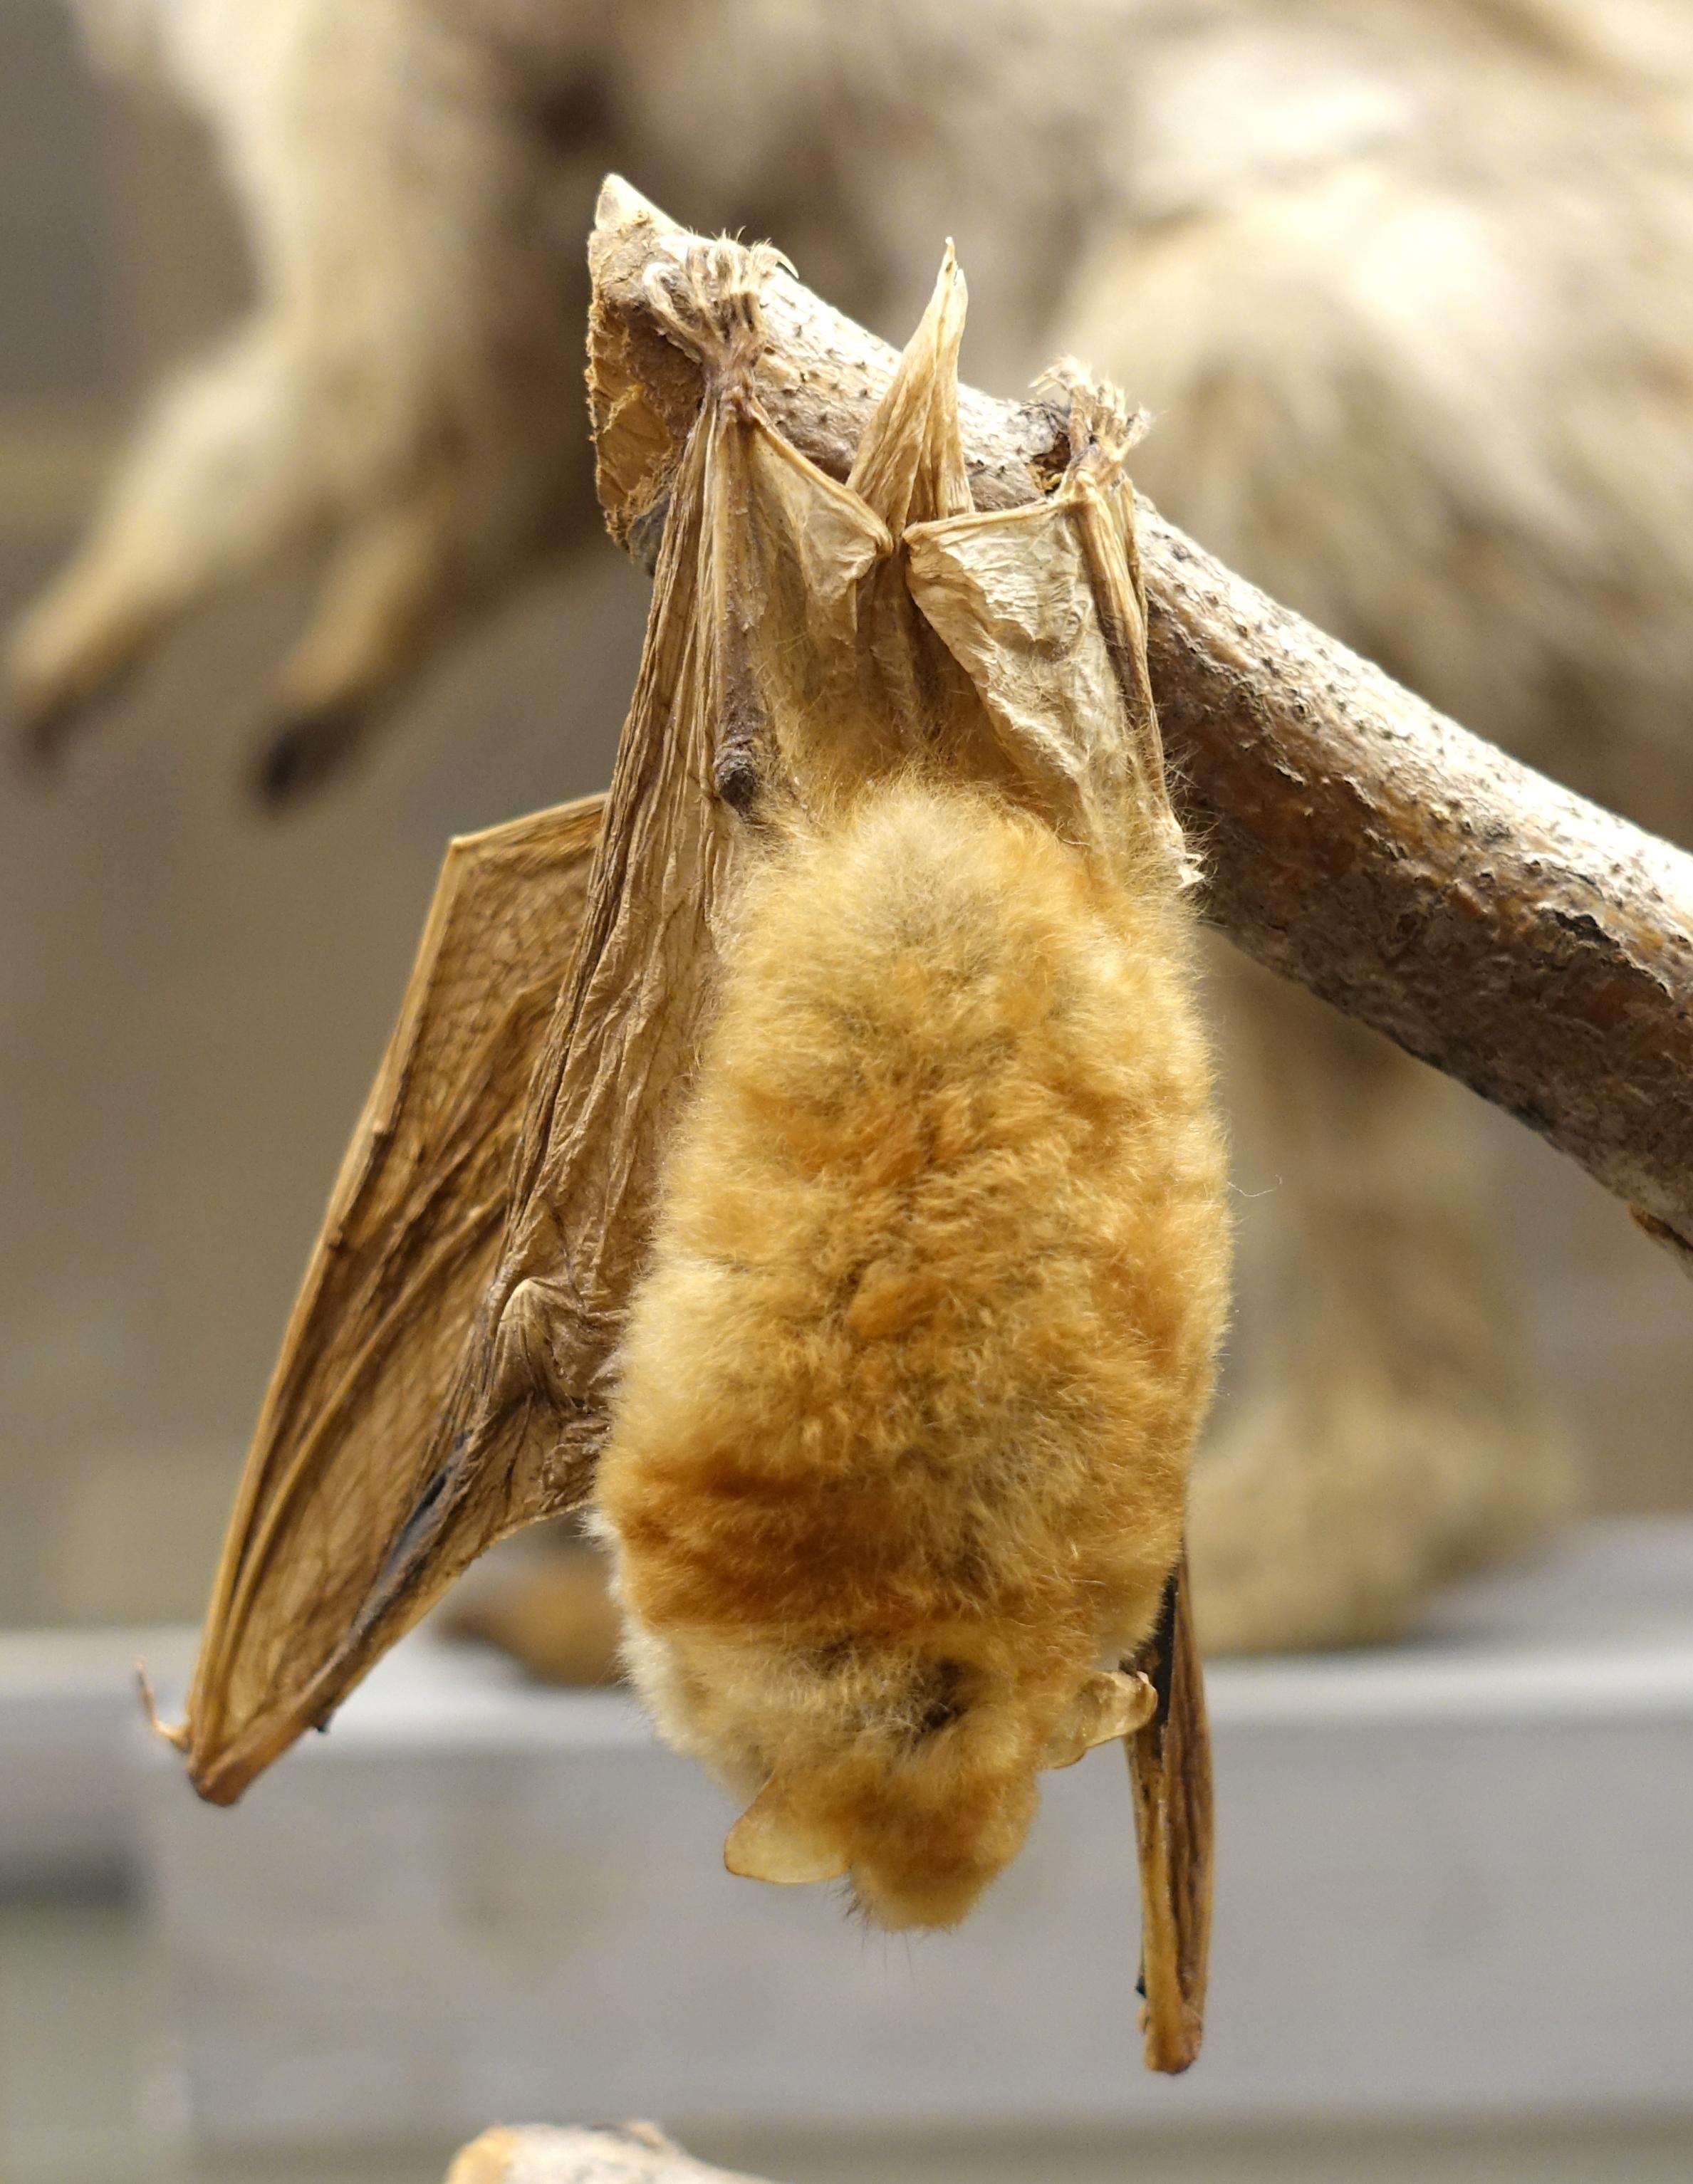 Angolan hairy bat